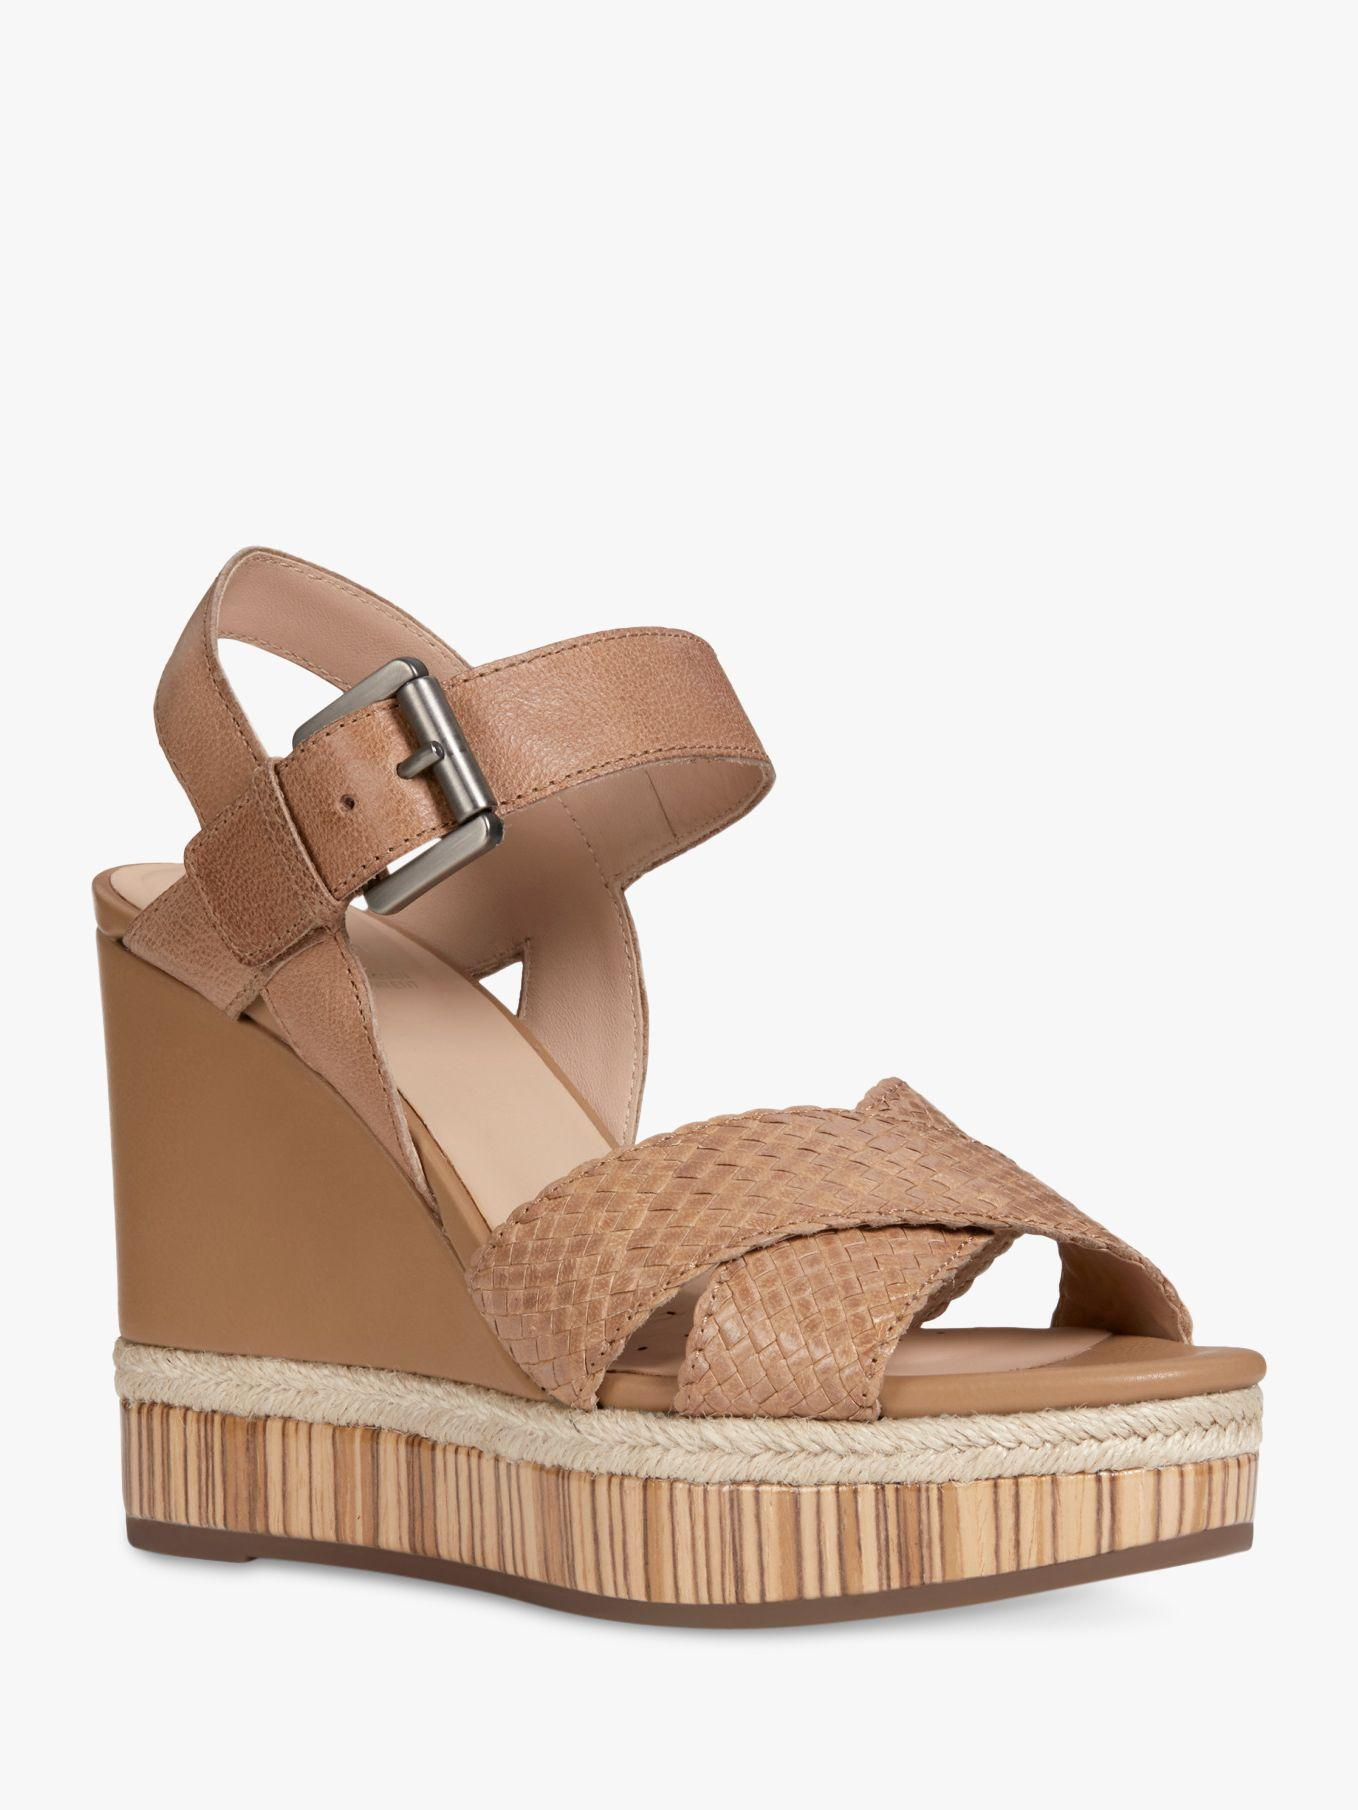 341419b8709 Geox - Brown Women s Yulimar Wedge Heeled Sandals - Lyst. View fullscreen